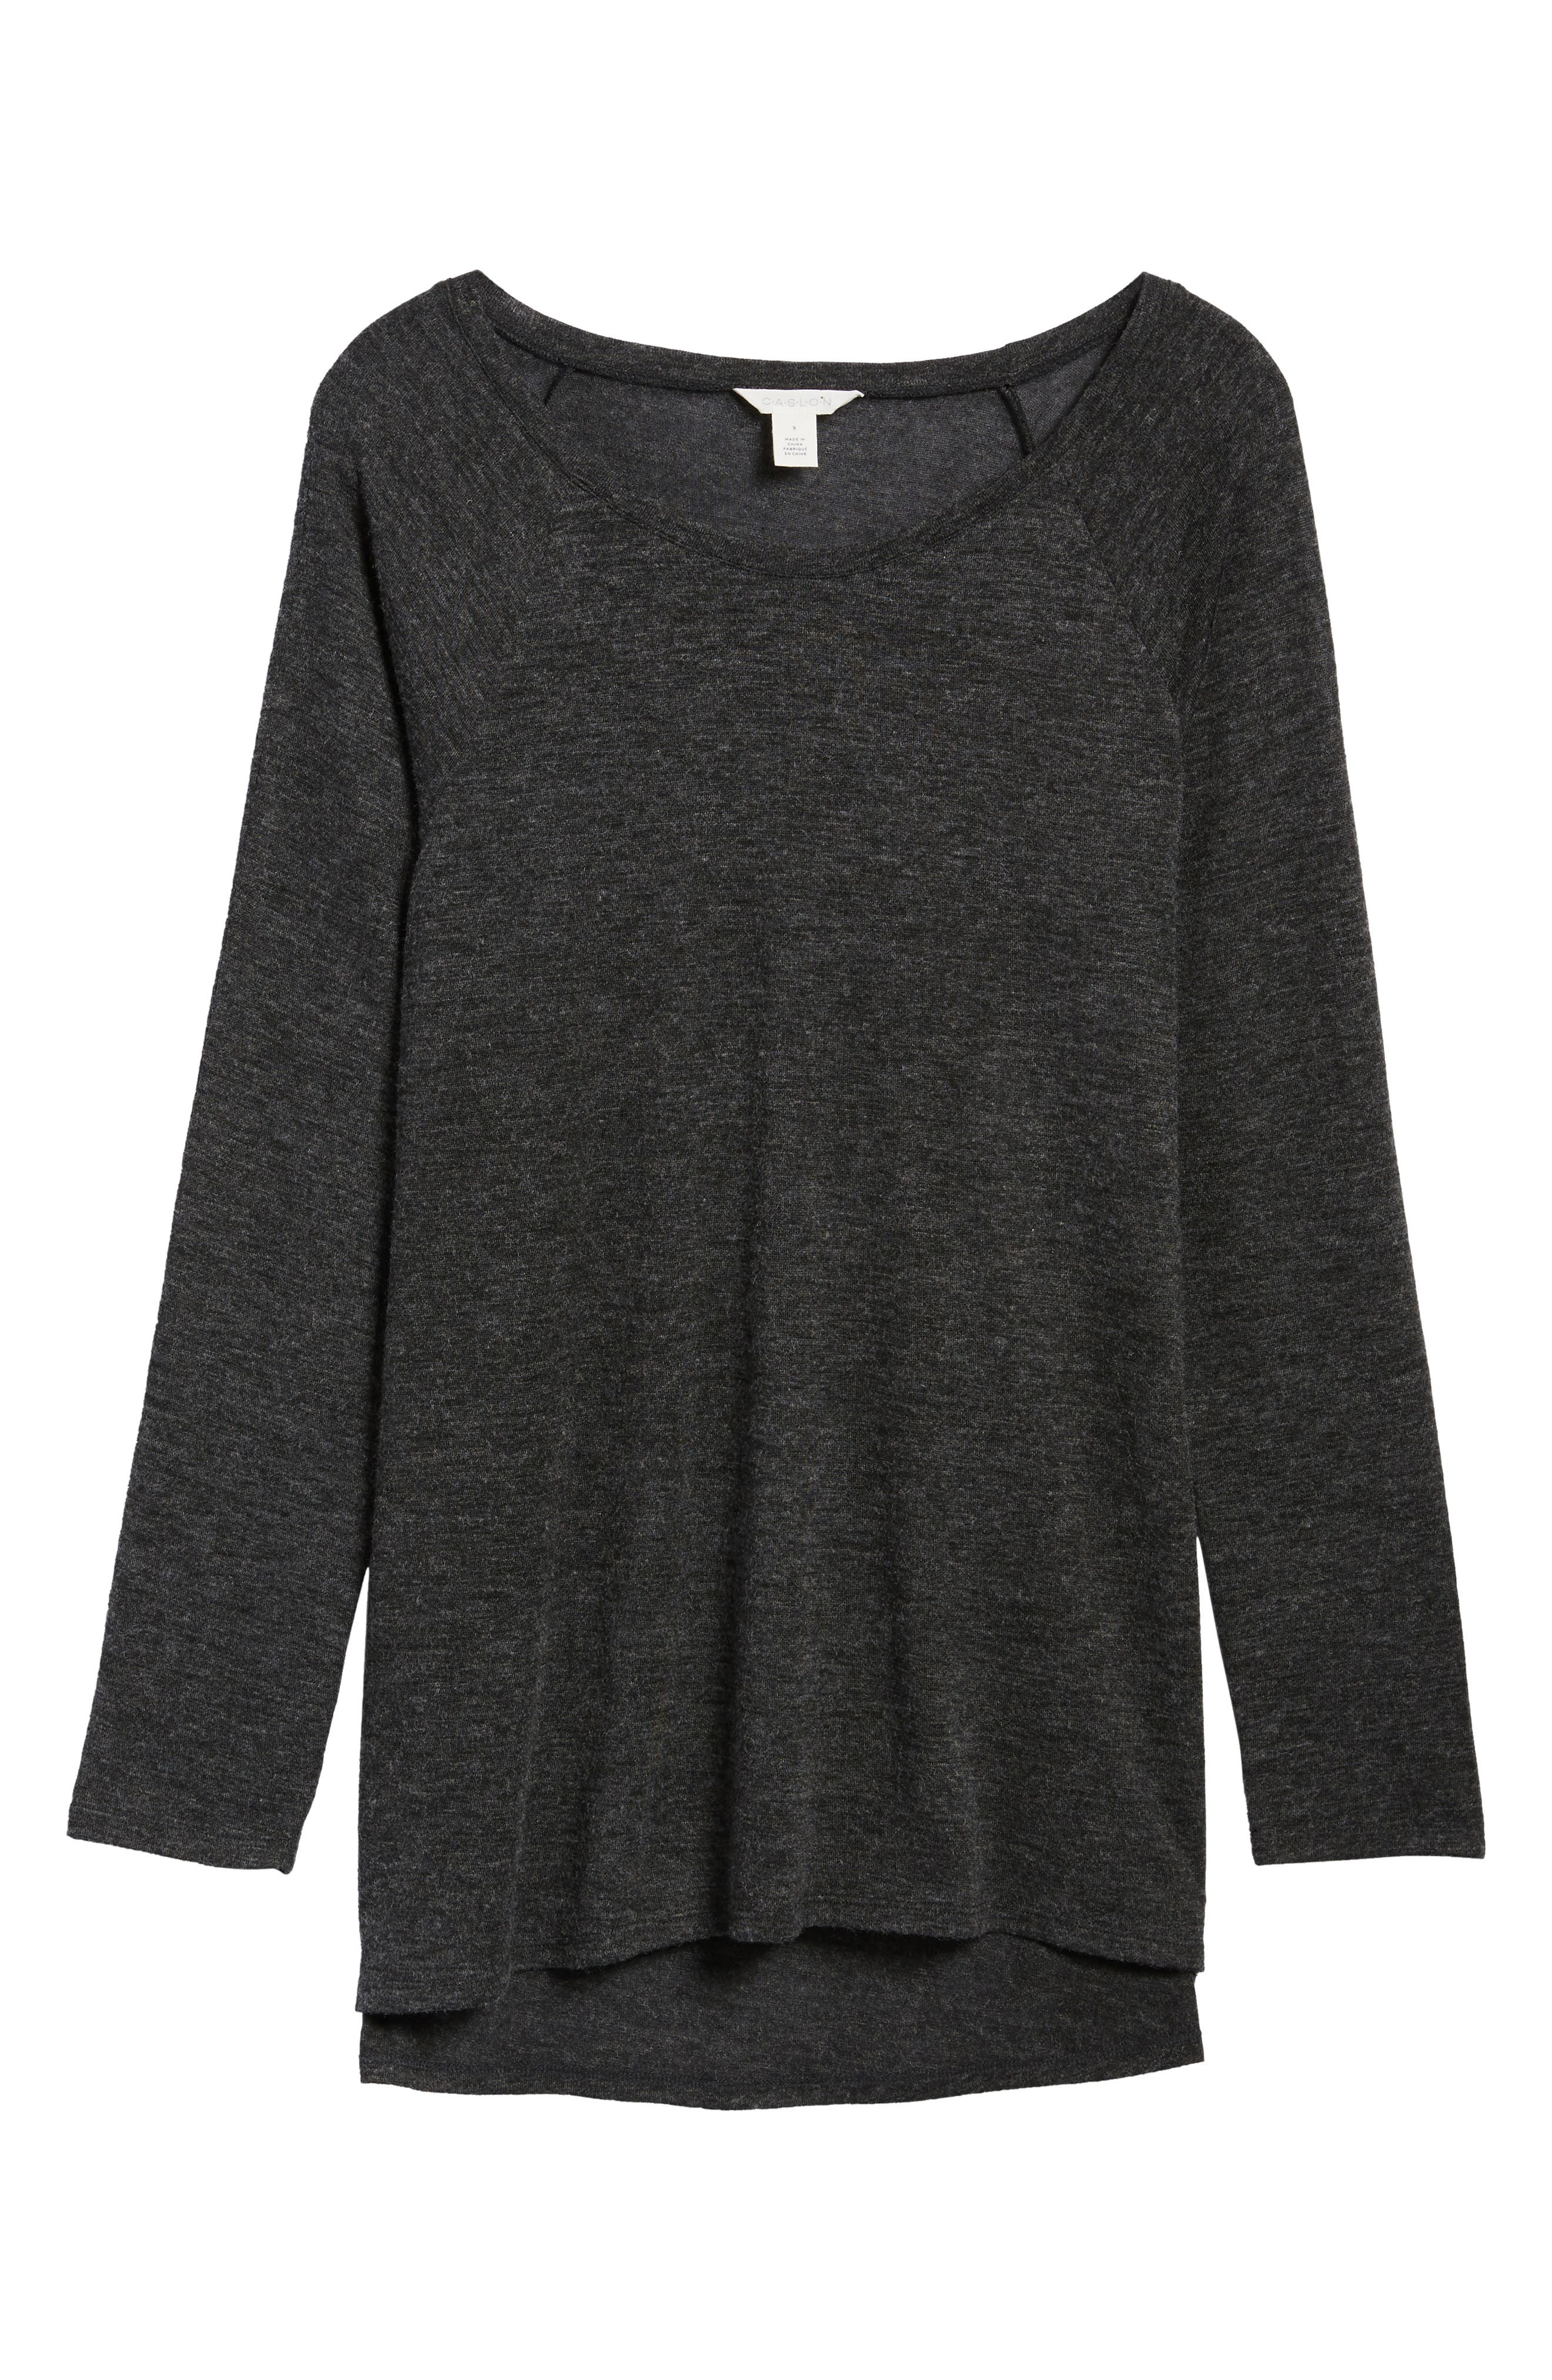 High/Low Tunic Sweatshirt,                             Alternate thumbnail 6, color,                             001